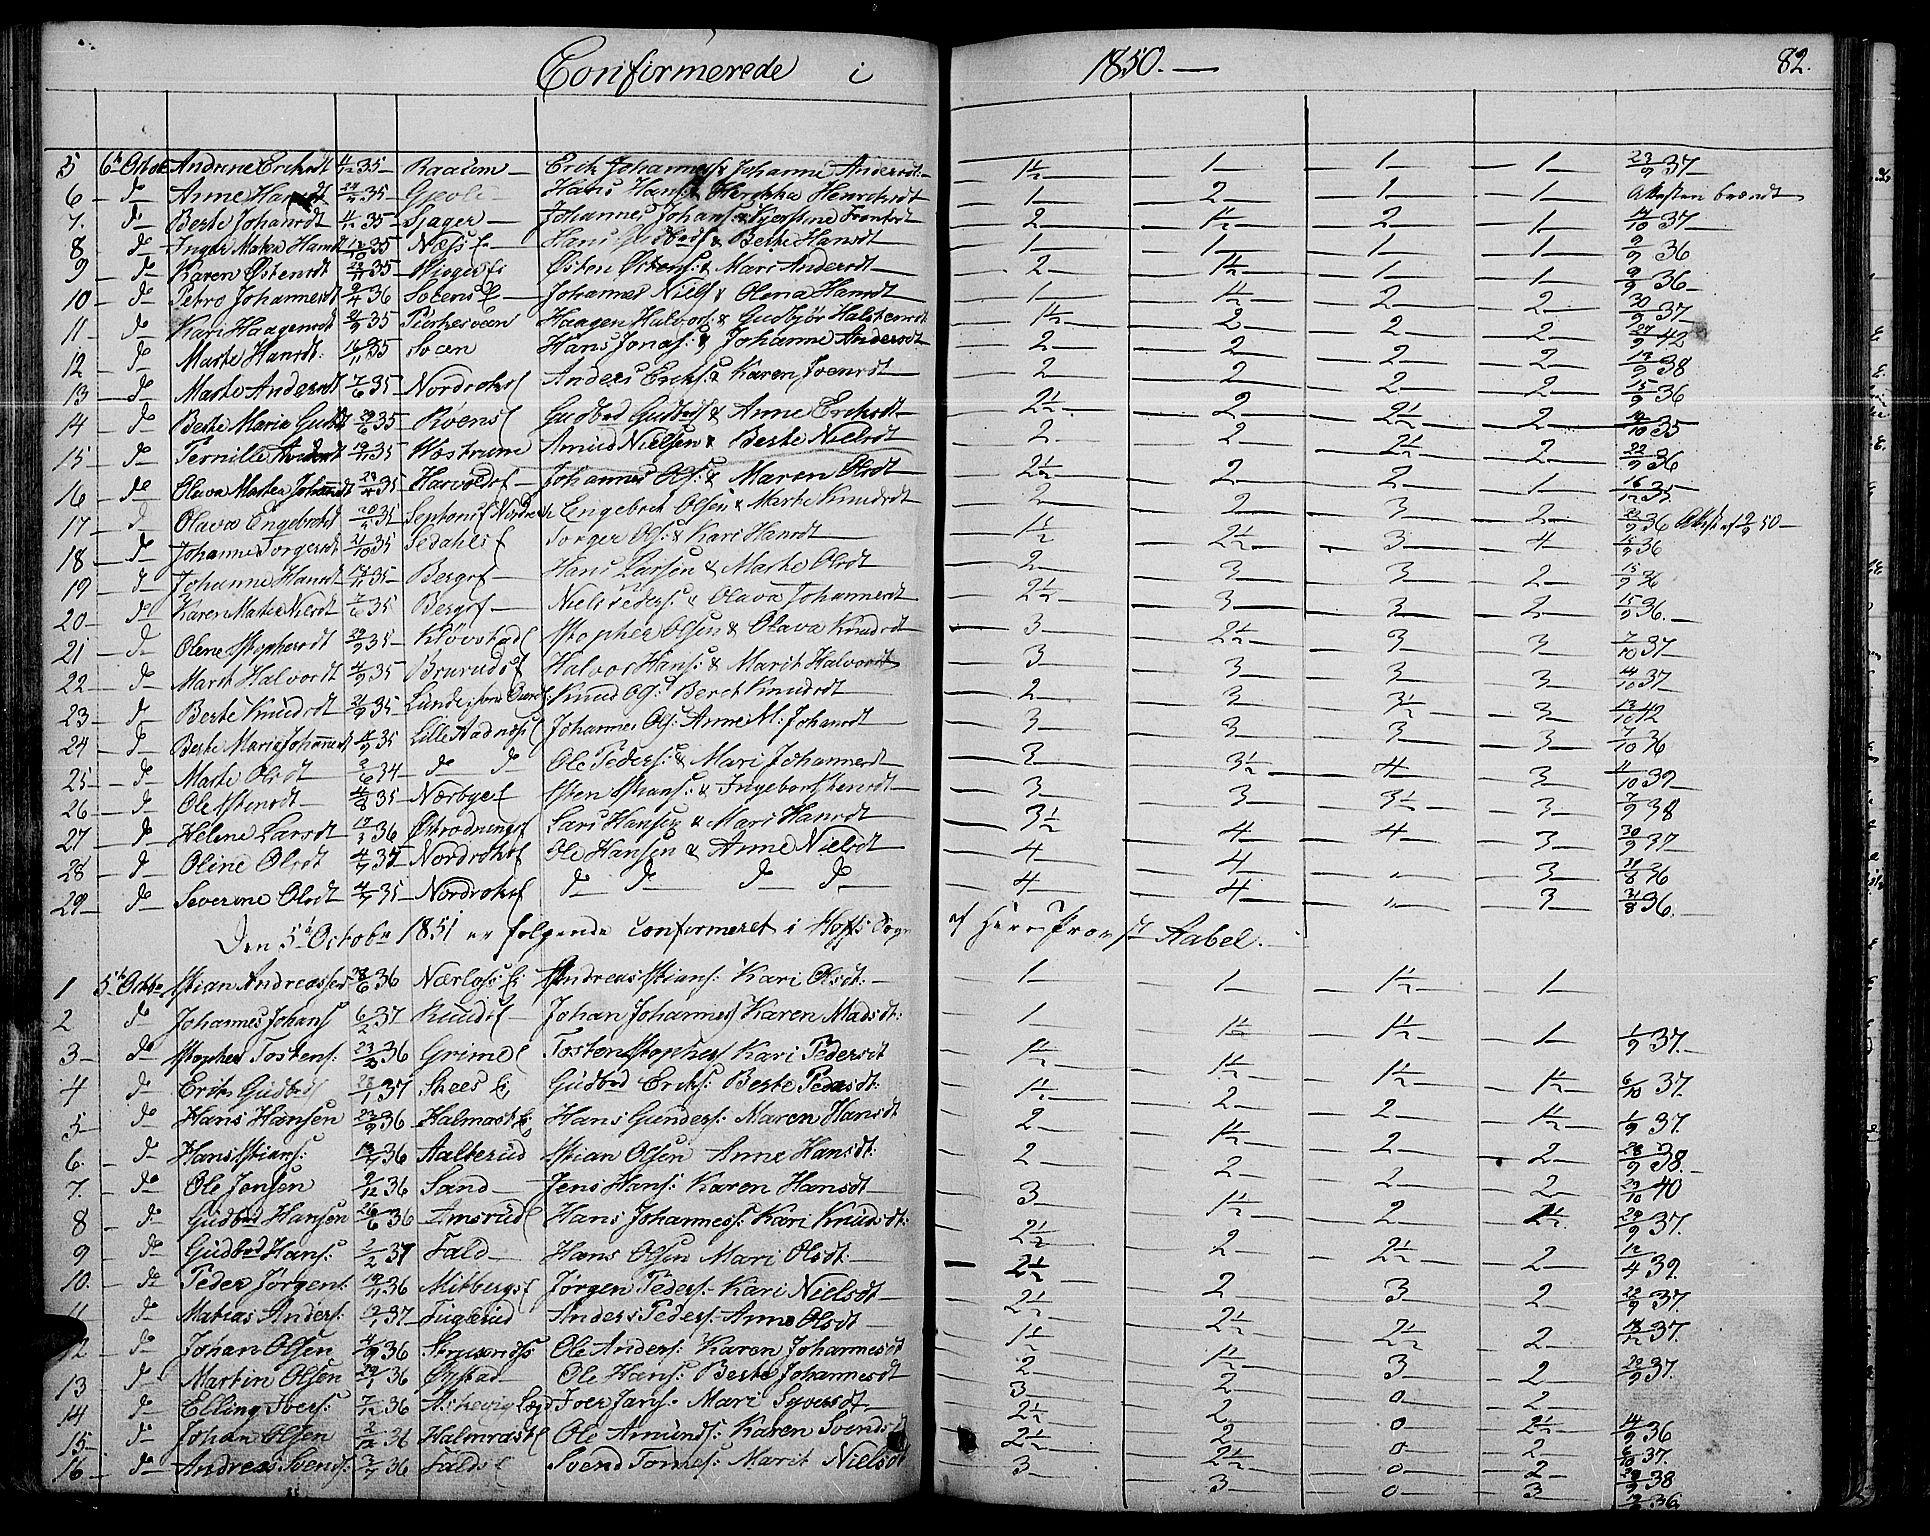 SAH, Søndre Land prestekontor, L/L0001: Klokkerbok nr. 1, 1849-1883, s. 82